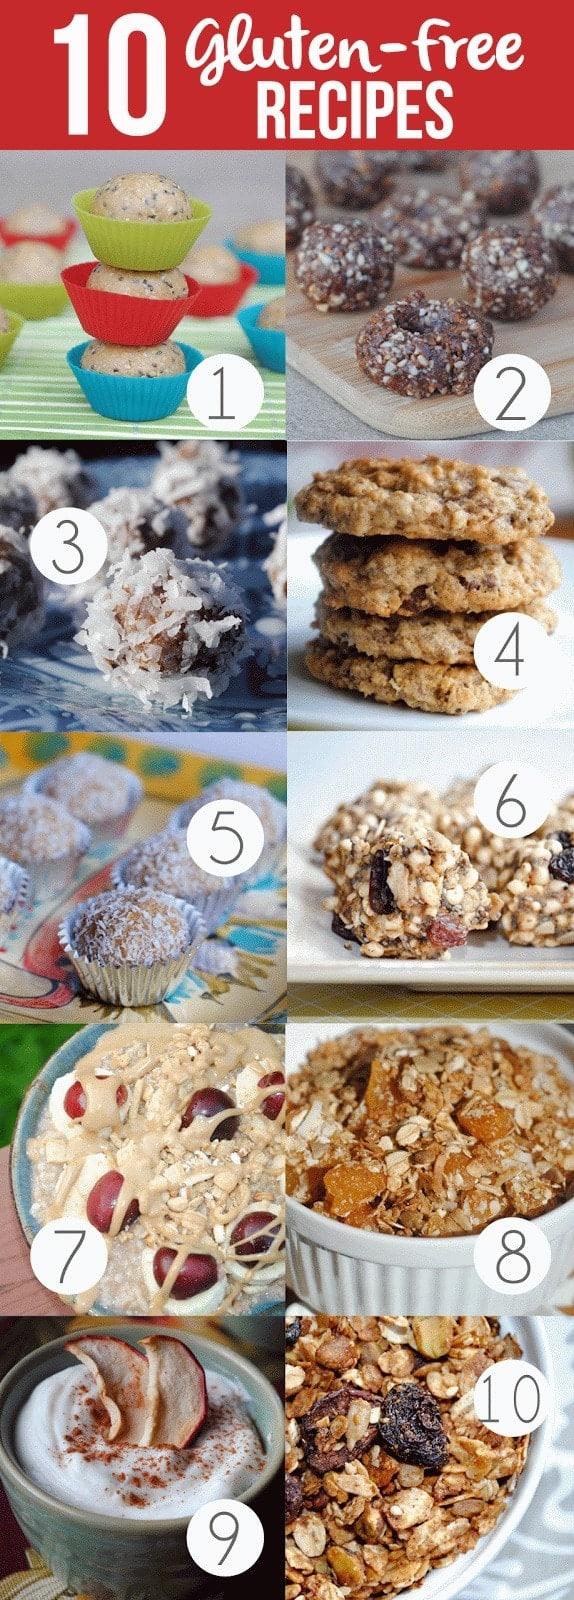 10 Gluten-Free Recipes